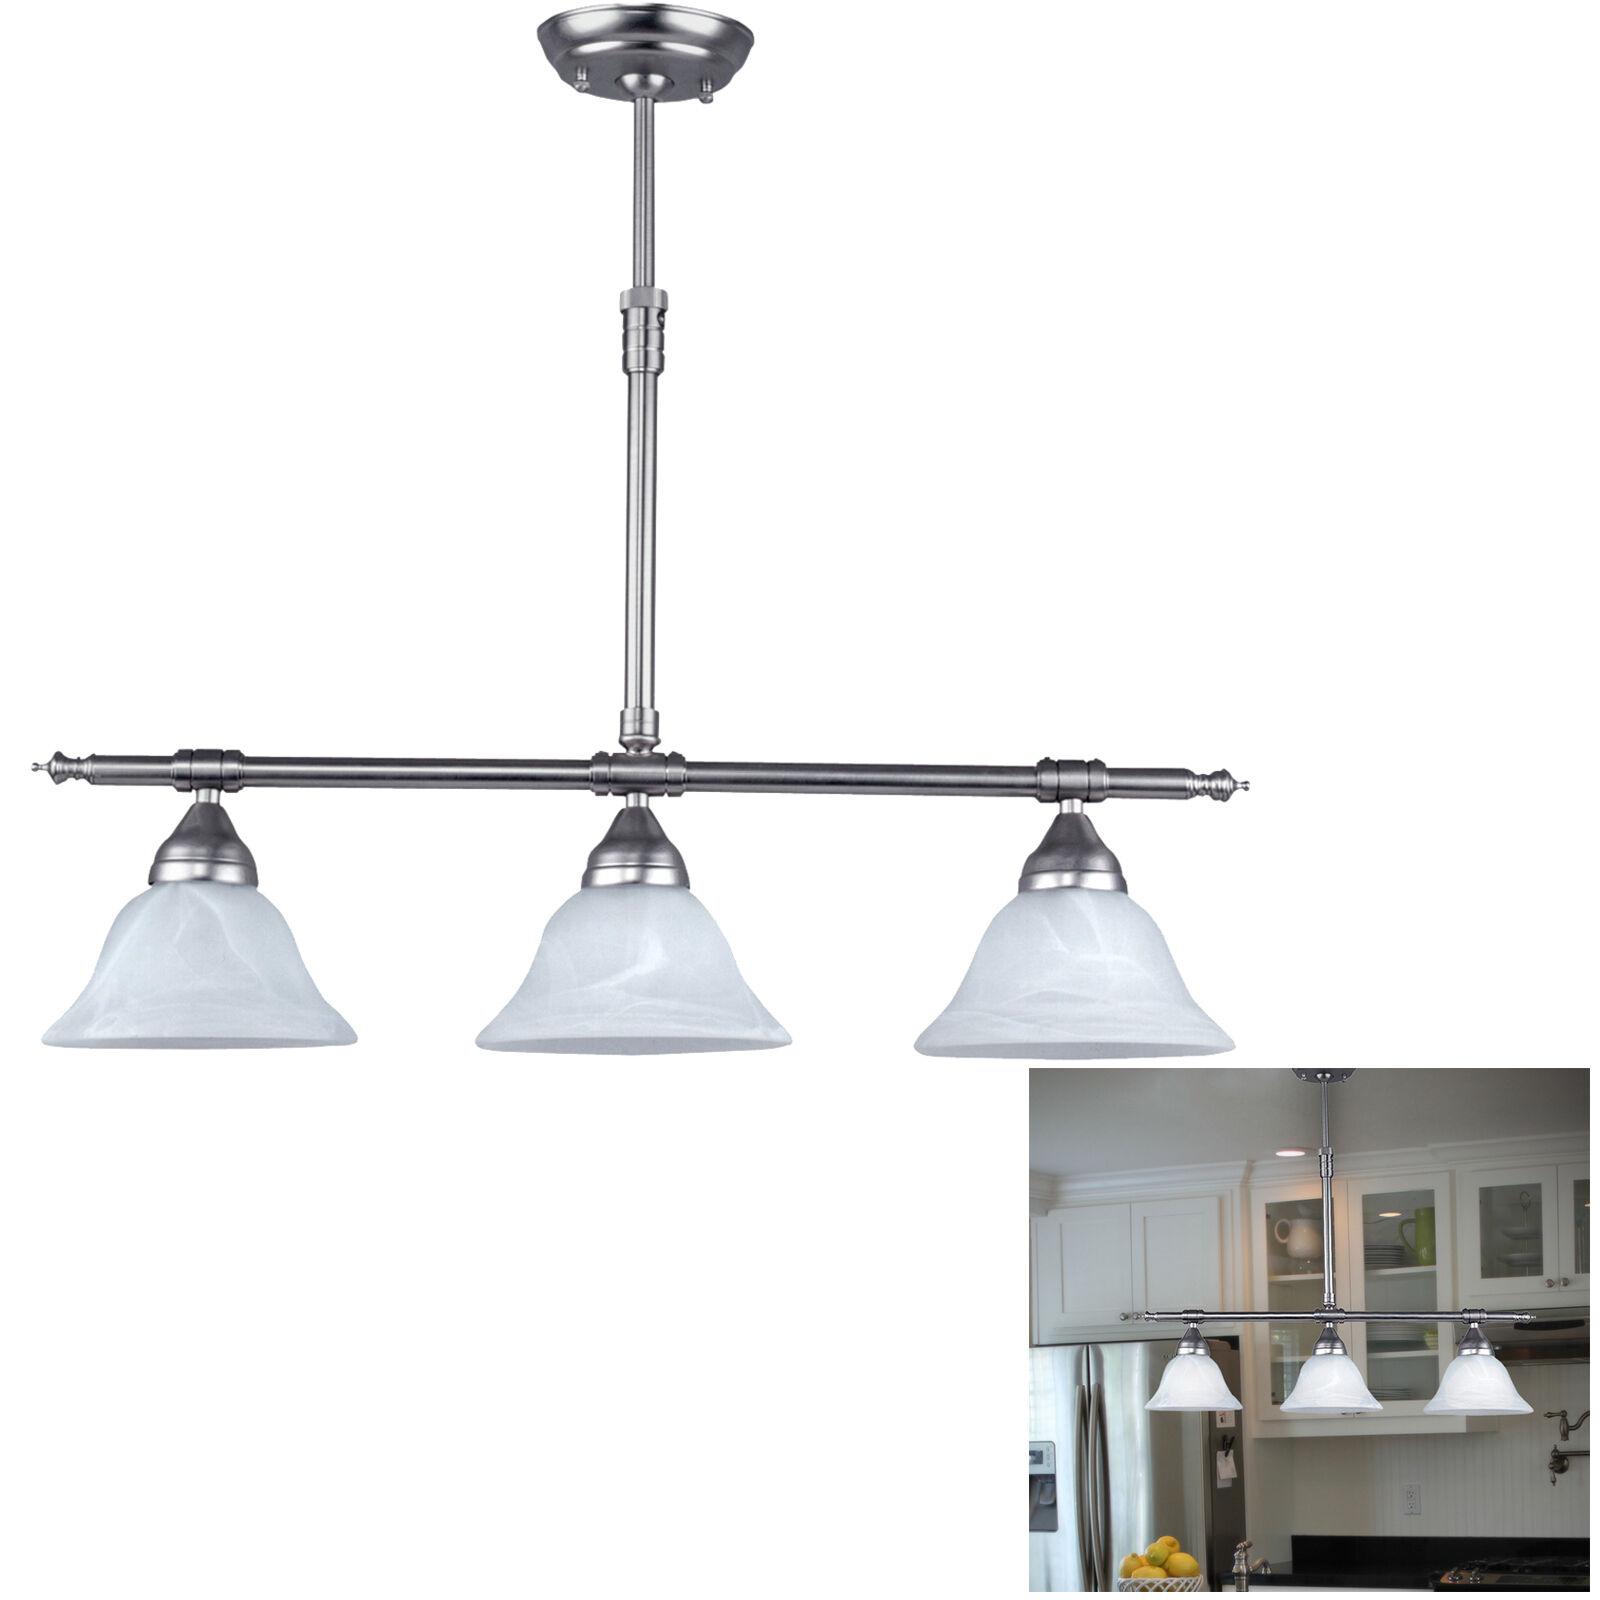 Trans Globe Lighting 3105 Bn Bathroom Light In Brushed Nickel For Sale Online Ebay